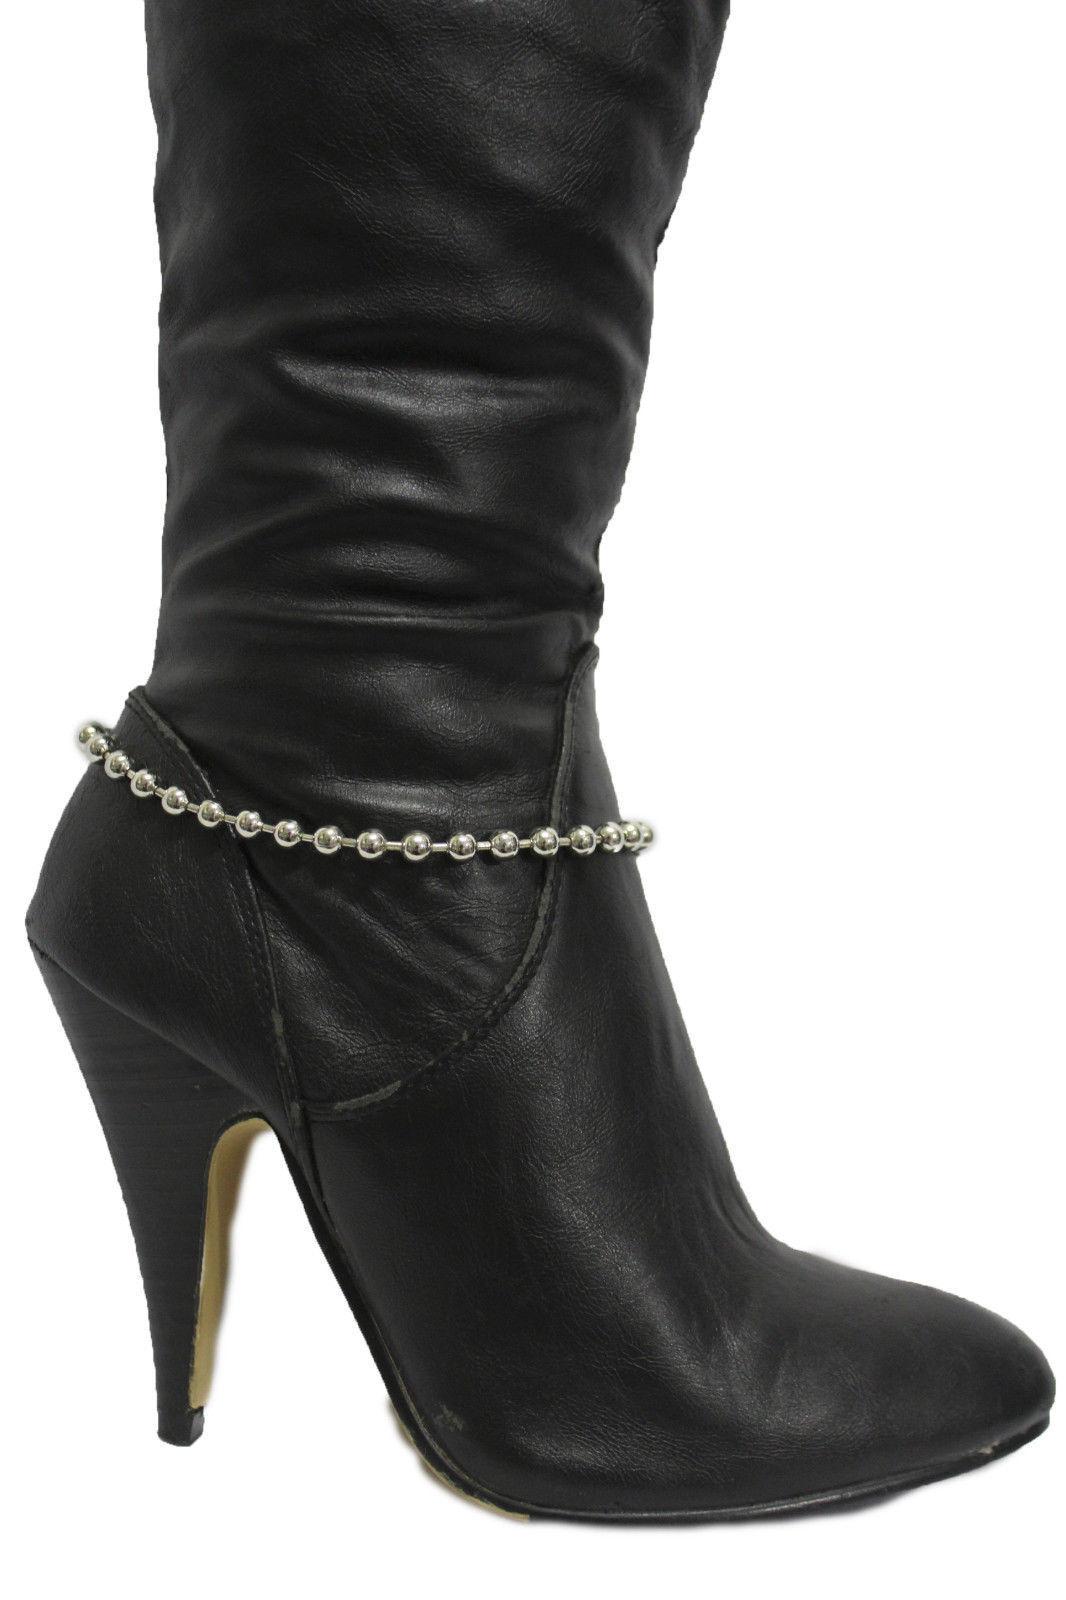 Women Western Boot Bracelet Silver Metal Chain Balls Anklet Shoe Classic Charm